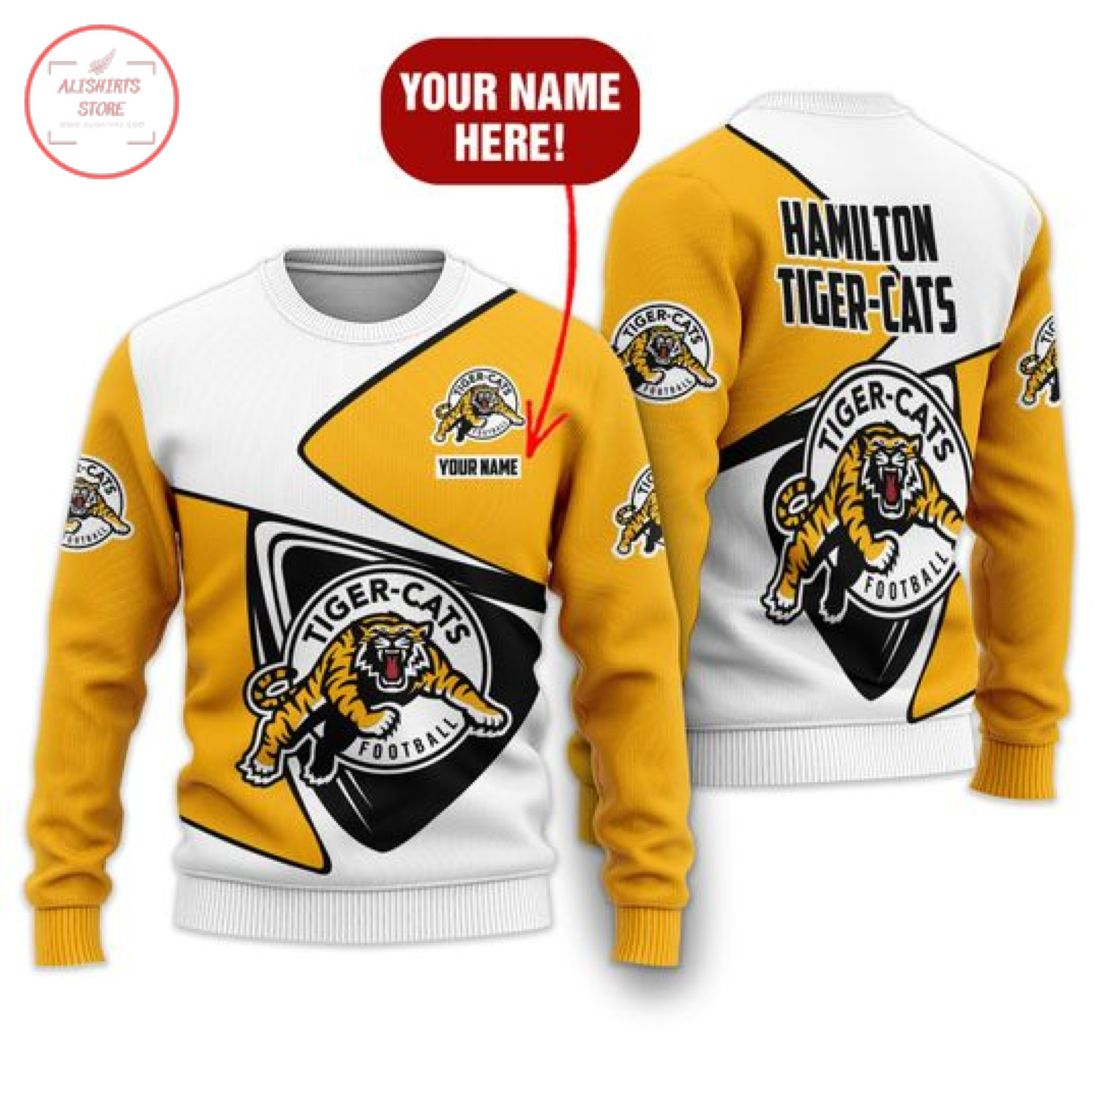 Cfl Hamilton Tiger-cats Personalized Shirts